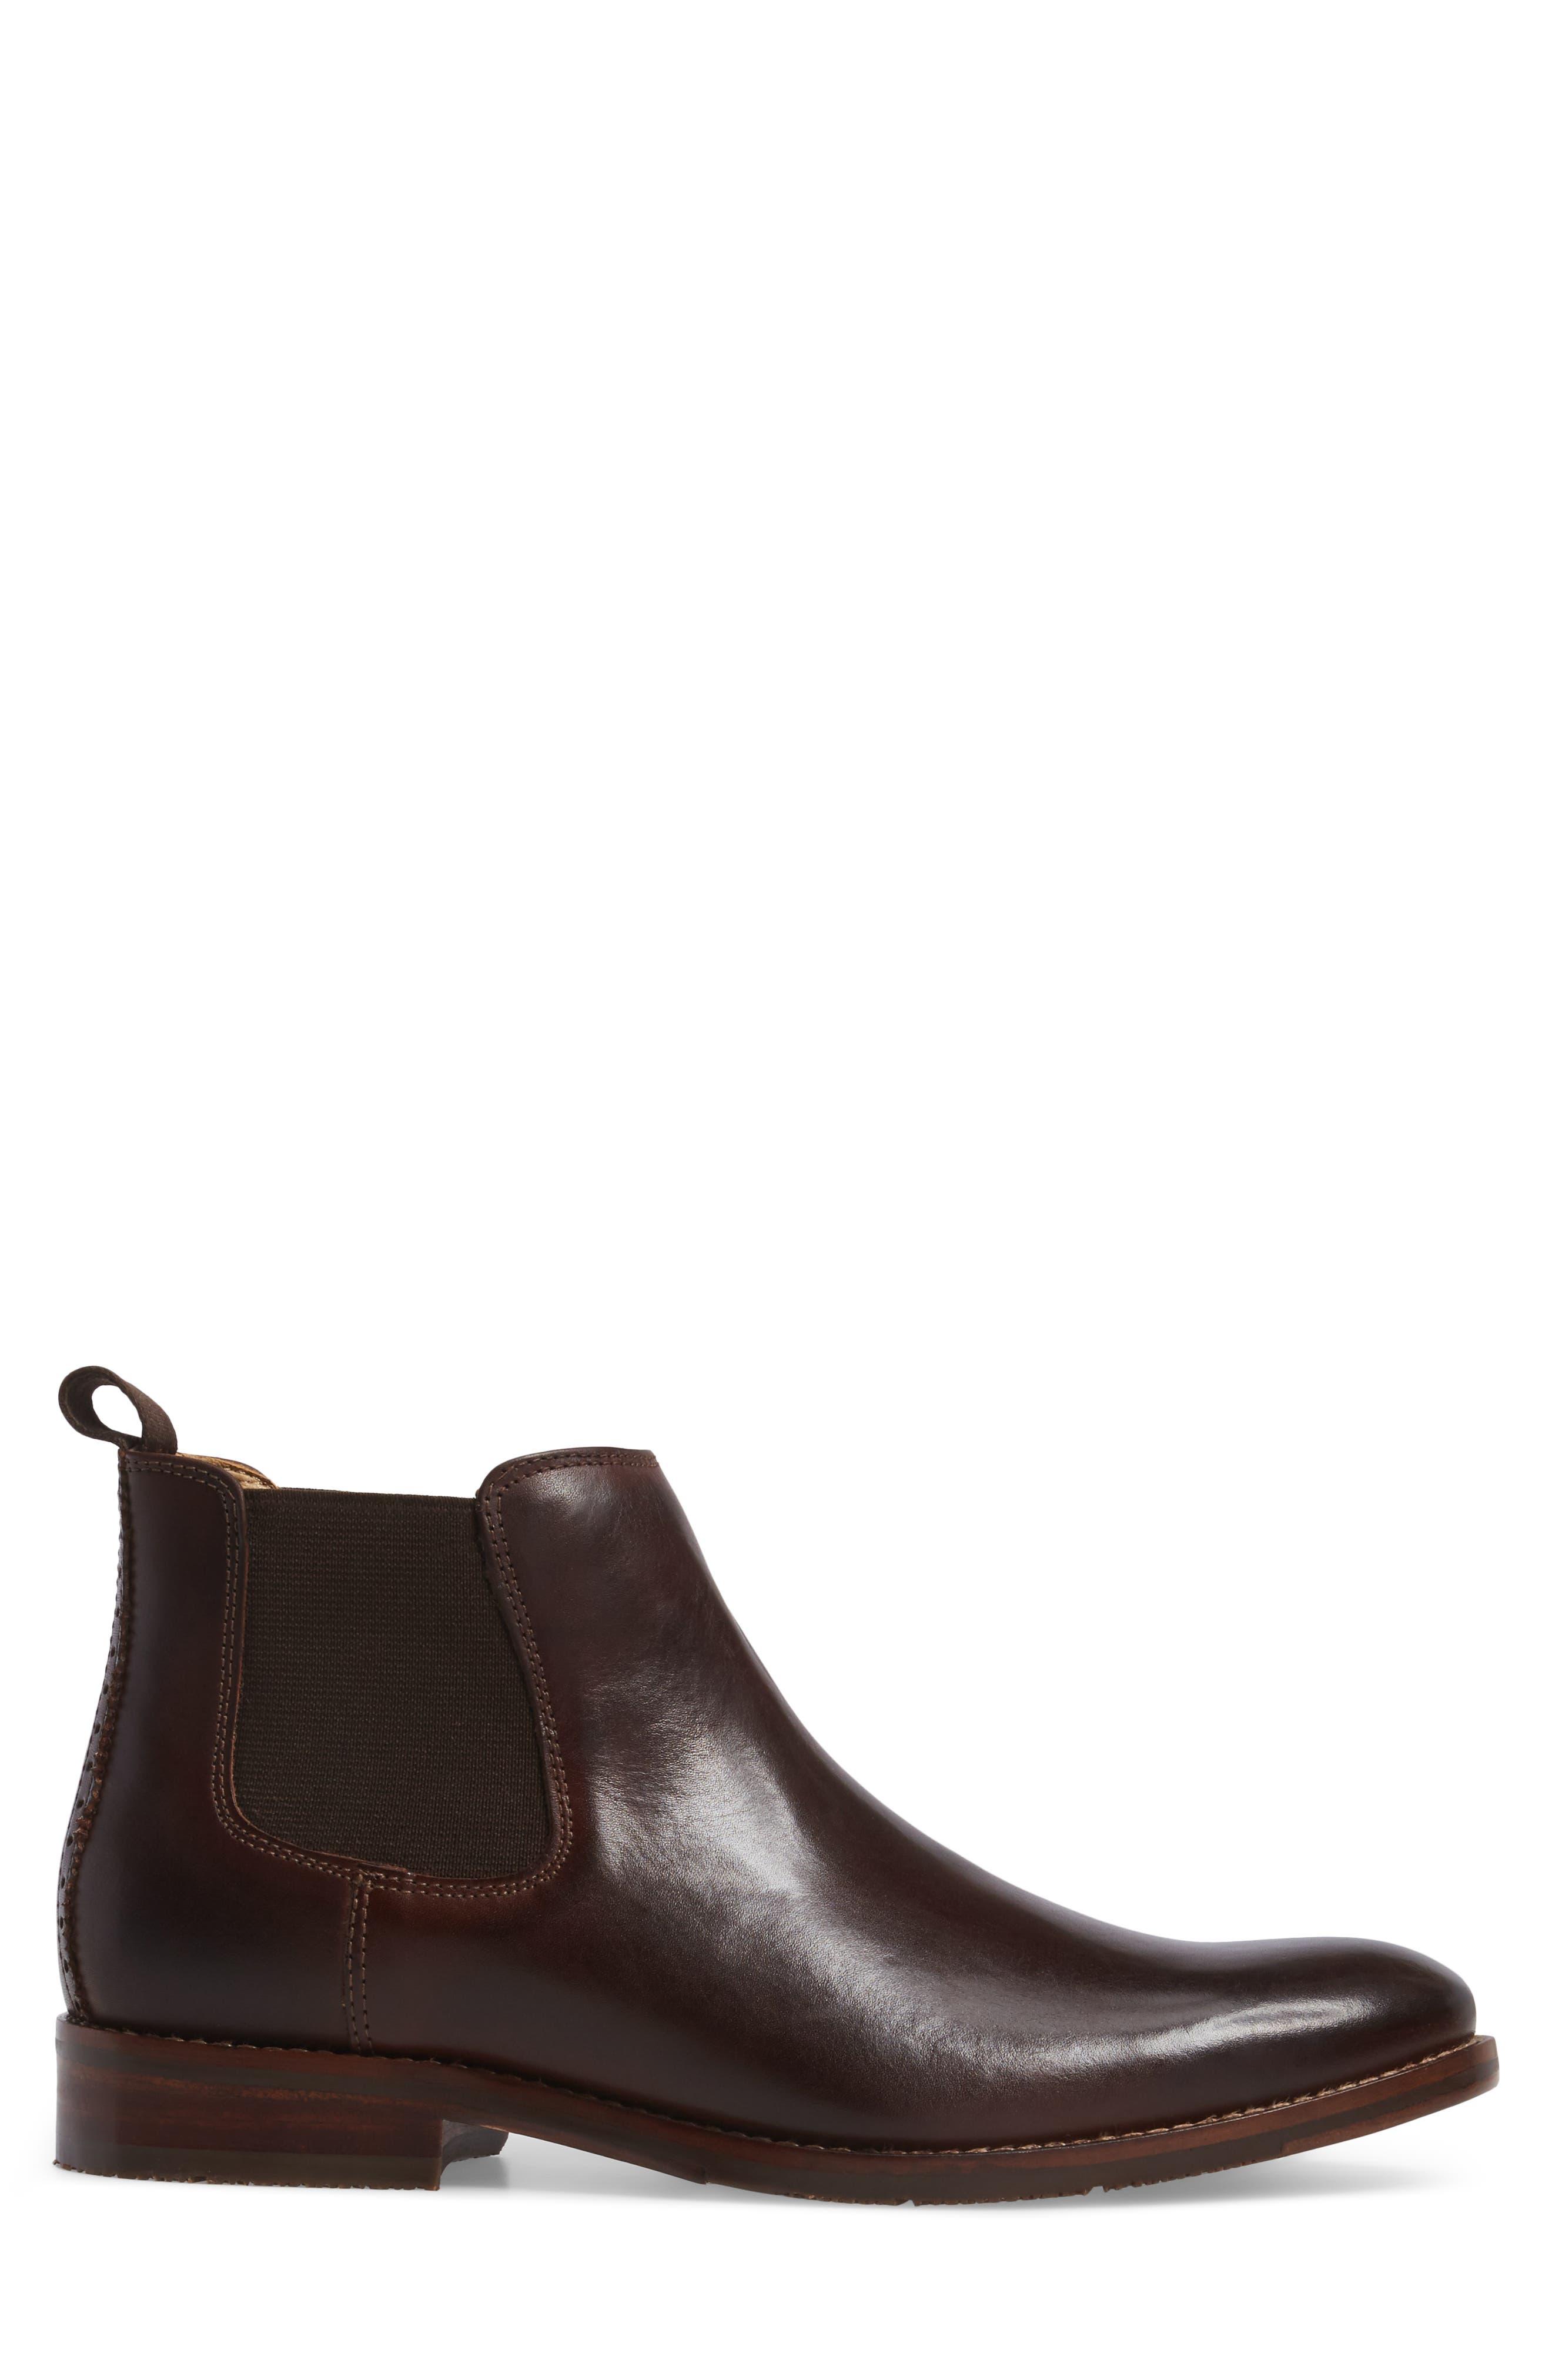 Garner Chelsea Boot,                             Alternate thumbnail 3, color,                             Mahogany Leather